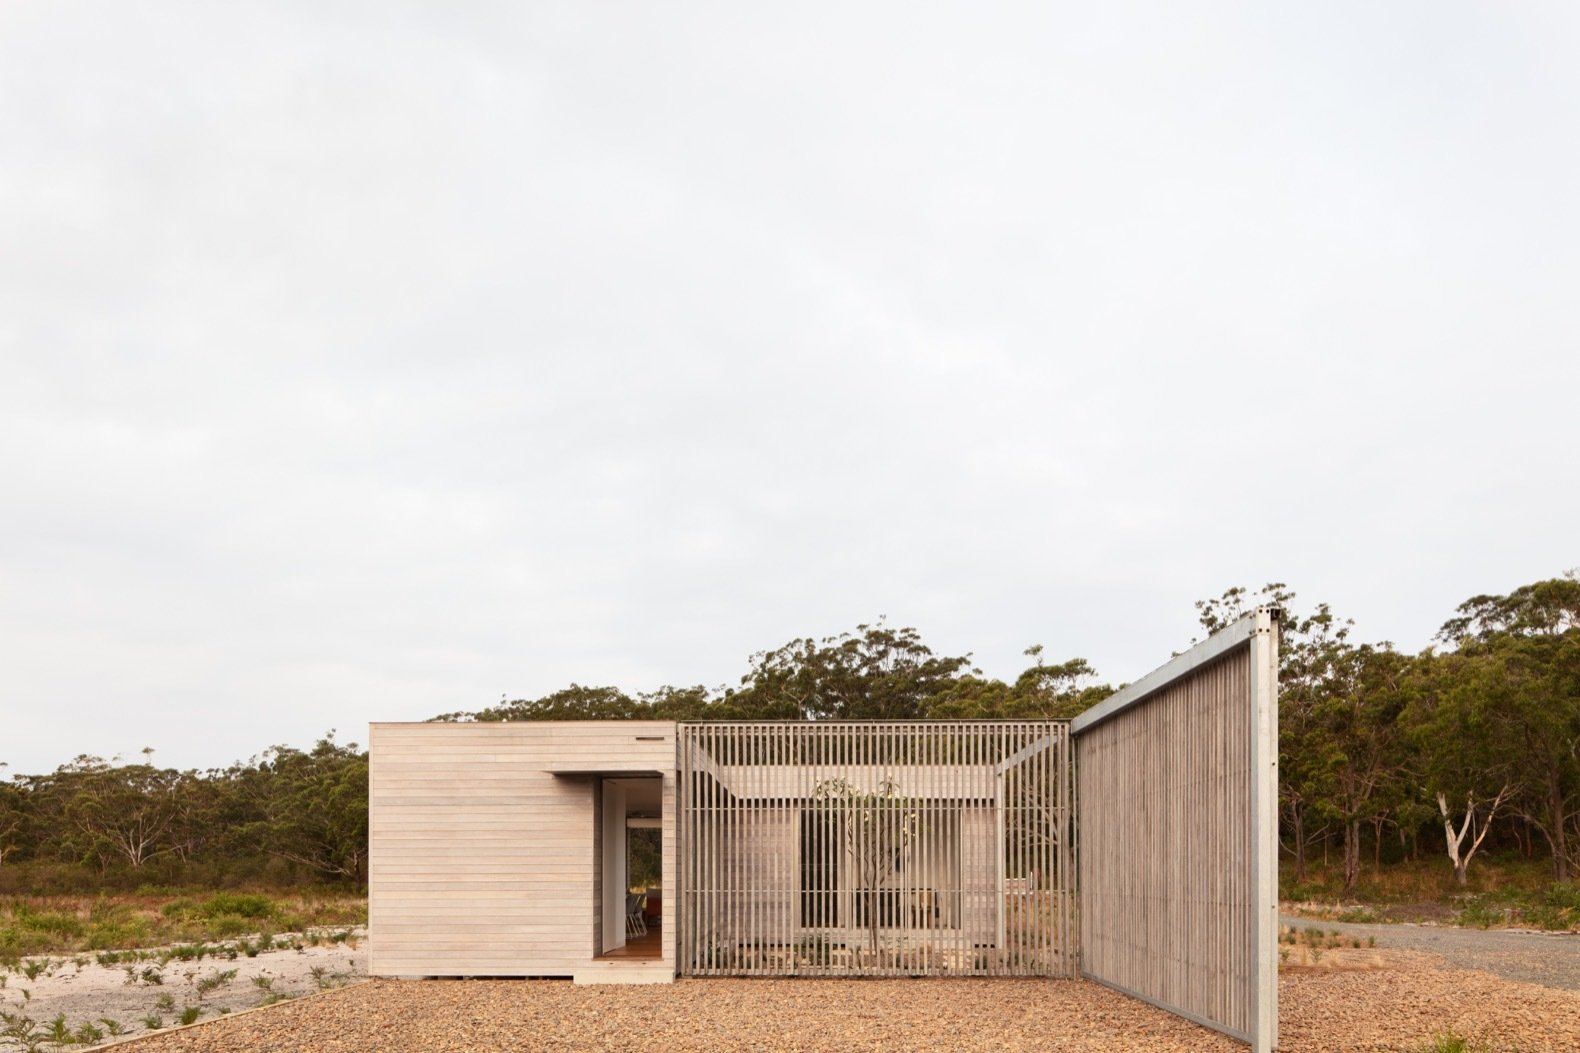 Exterior of Courtyard House by CHROFI and FABPREFAB